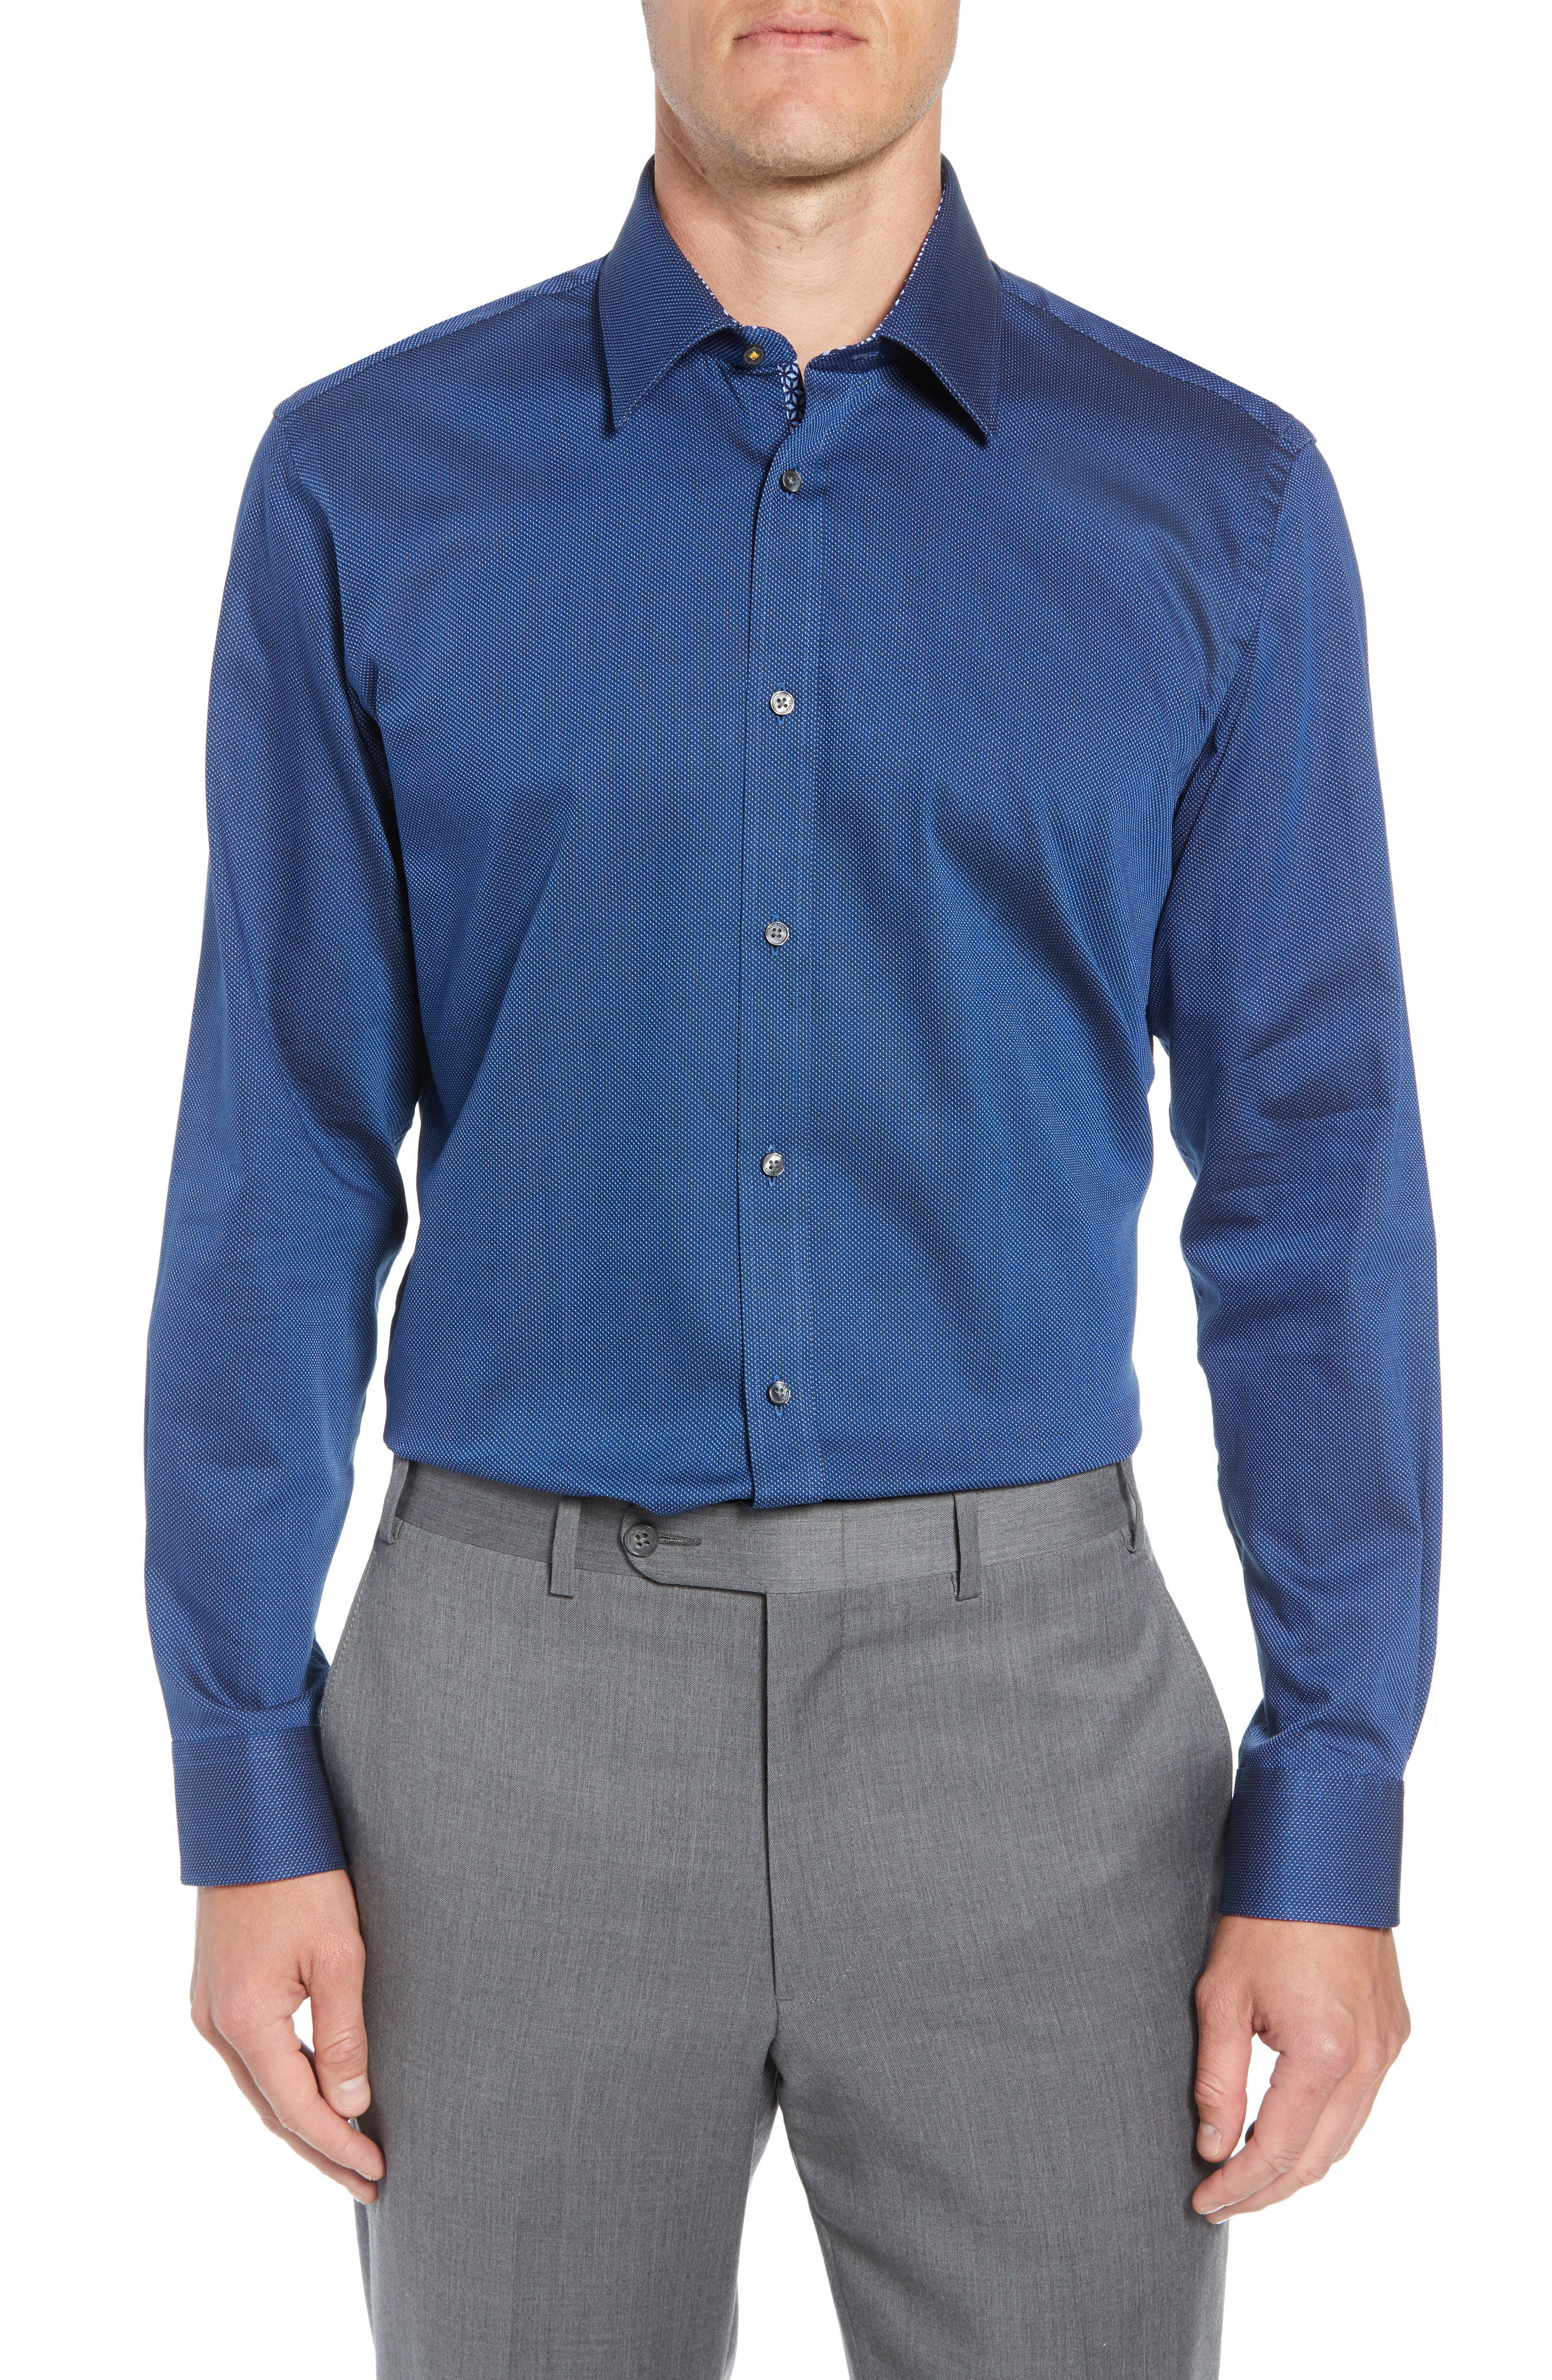 TED BAKER LONDON,                             Wikks Slim Fit Print Dress Shirt,                             Main thumbnail 1, color,                             410